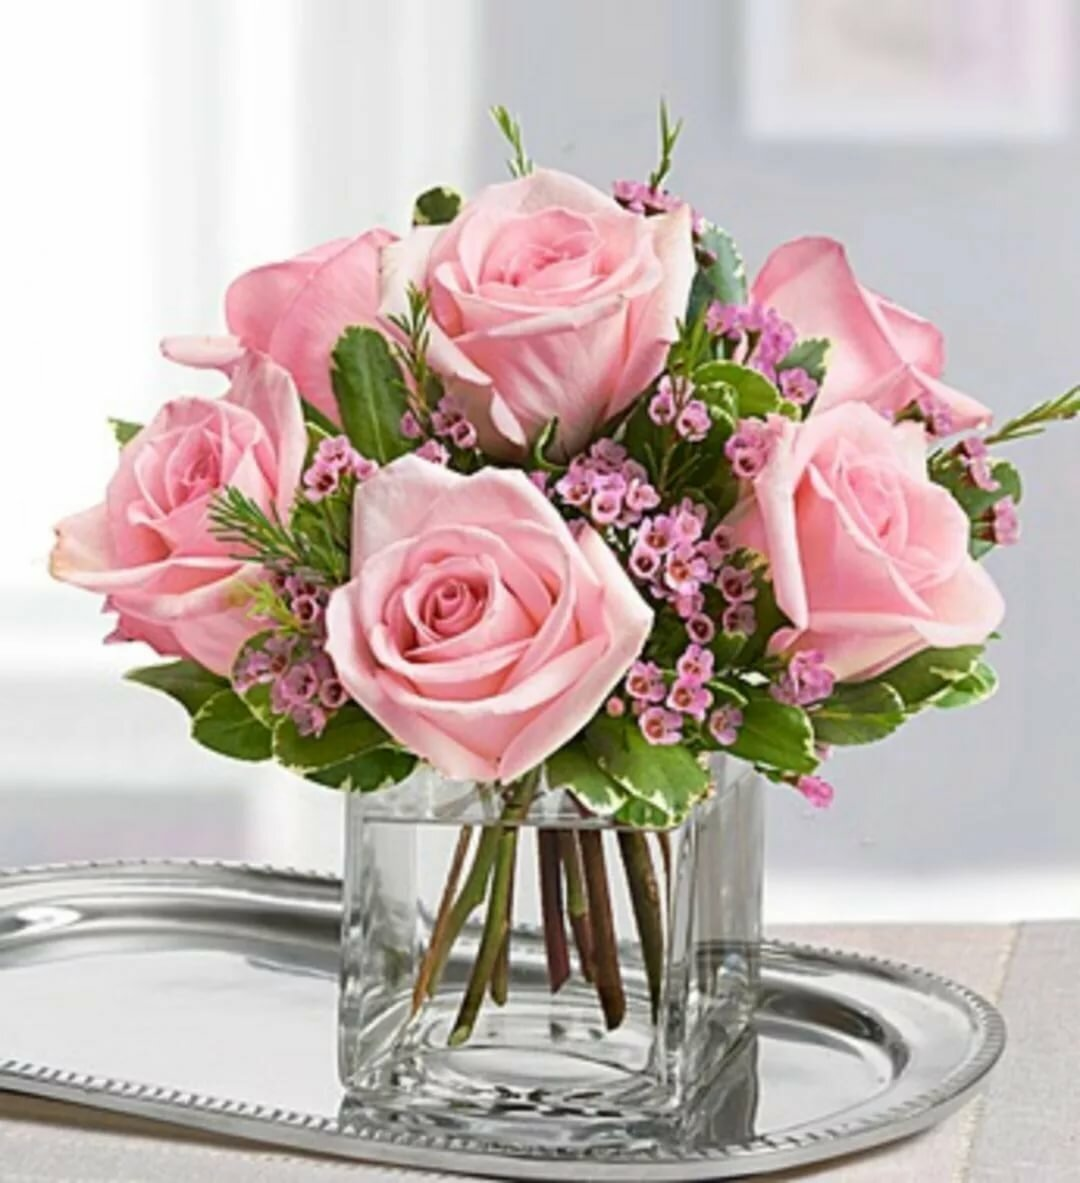 Картинки фото цветы в вазе